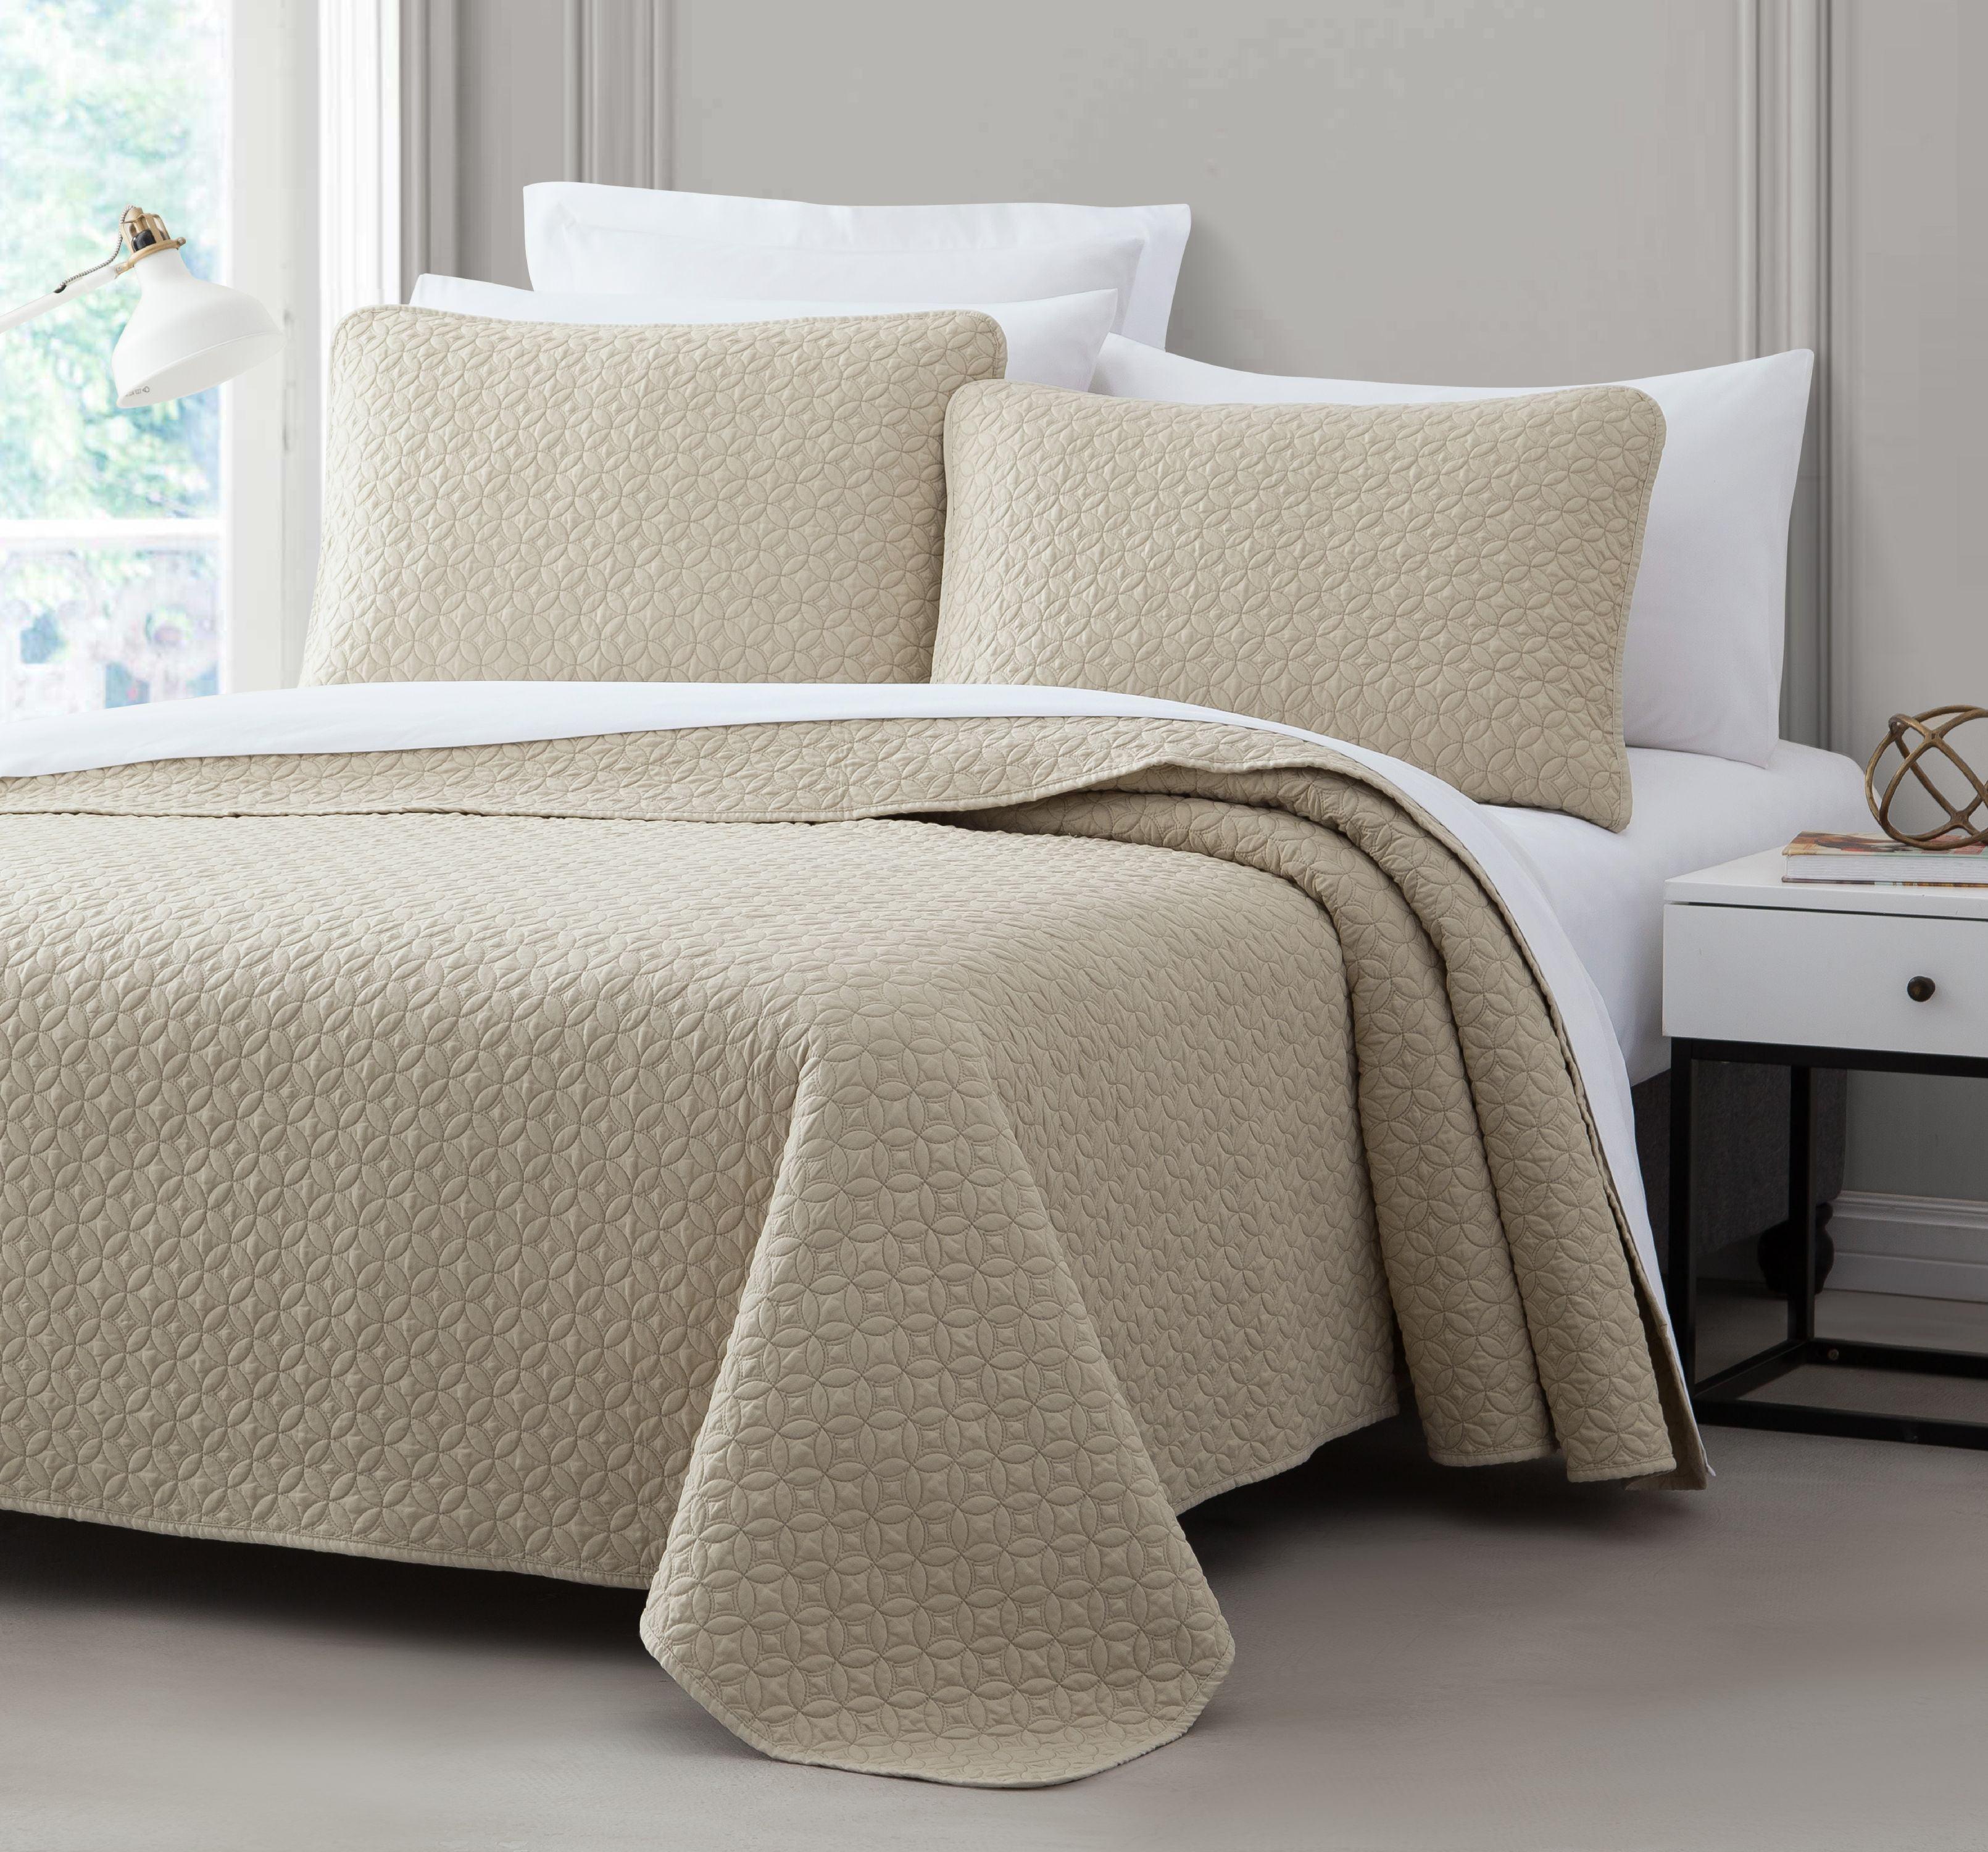 Cozy Beddings Titan 3-Piece Bedspread Coverlet Set by BH&B International Inc.